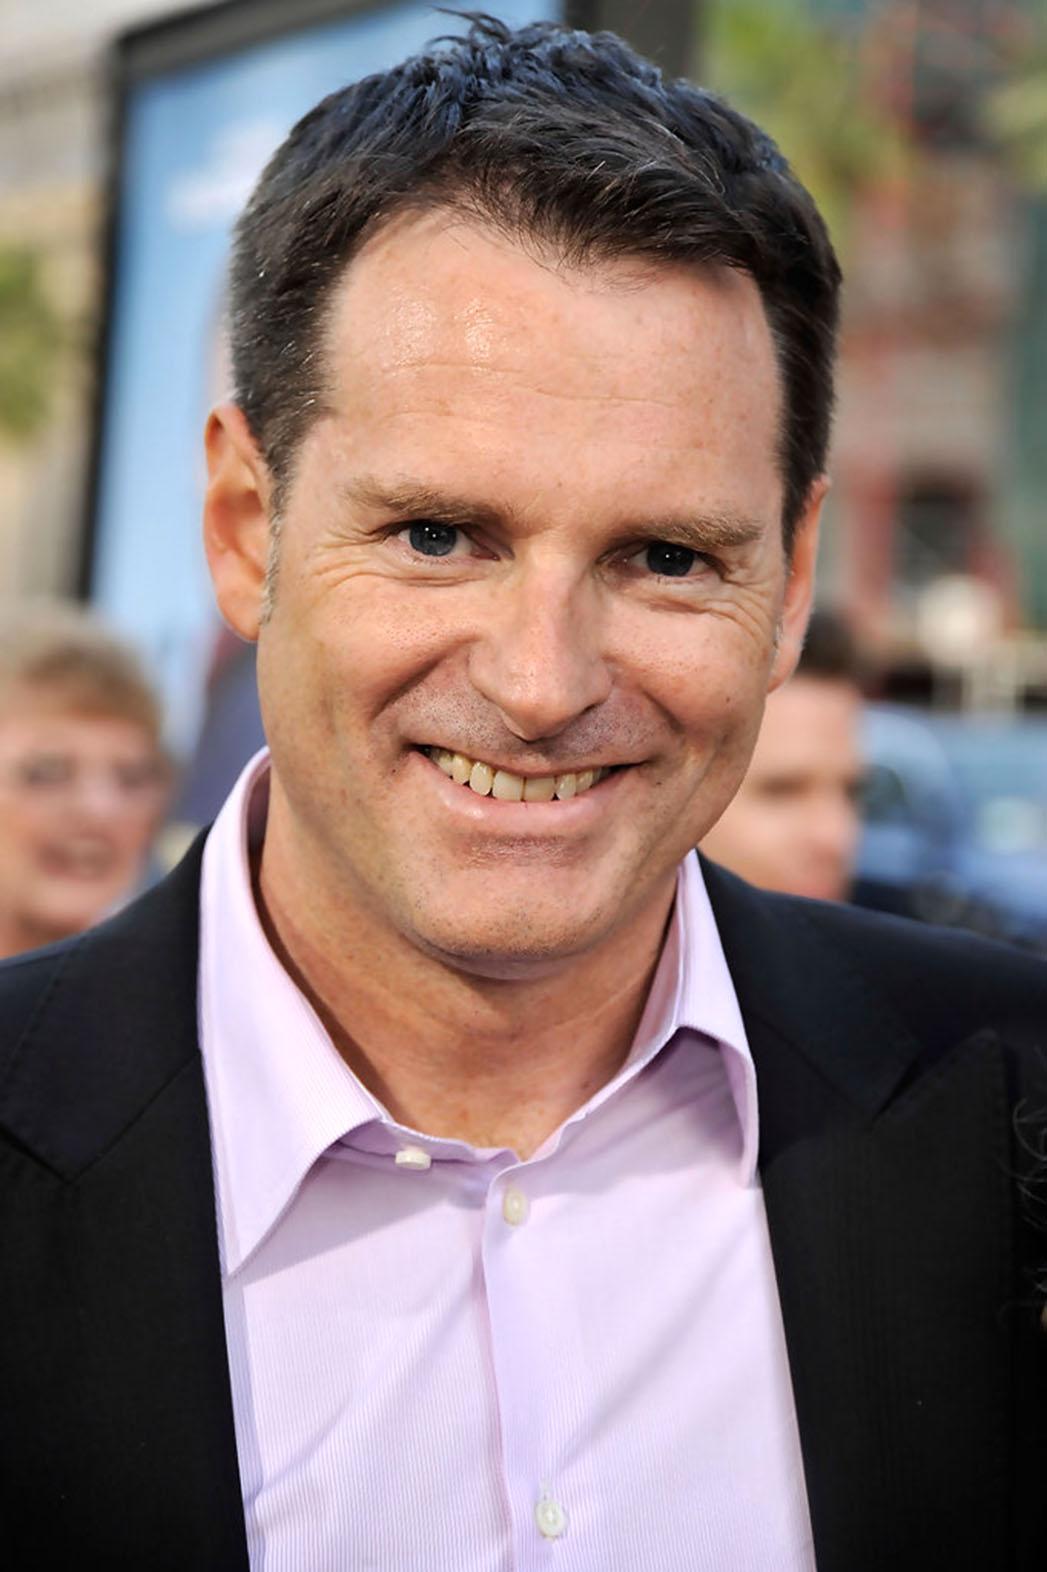 Mark Waters as Director of Bad Santa 2 - P 2015